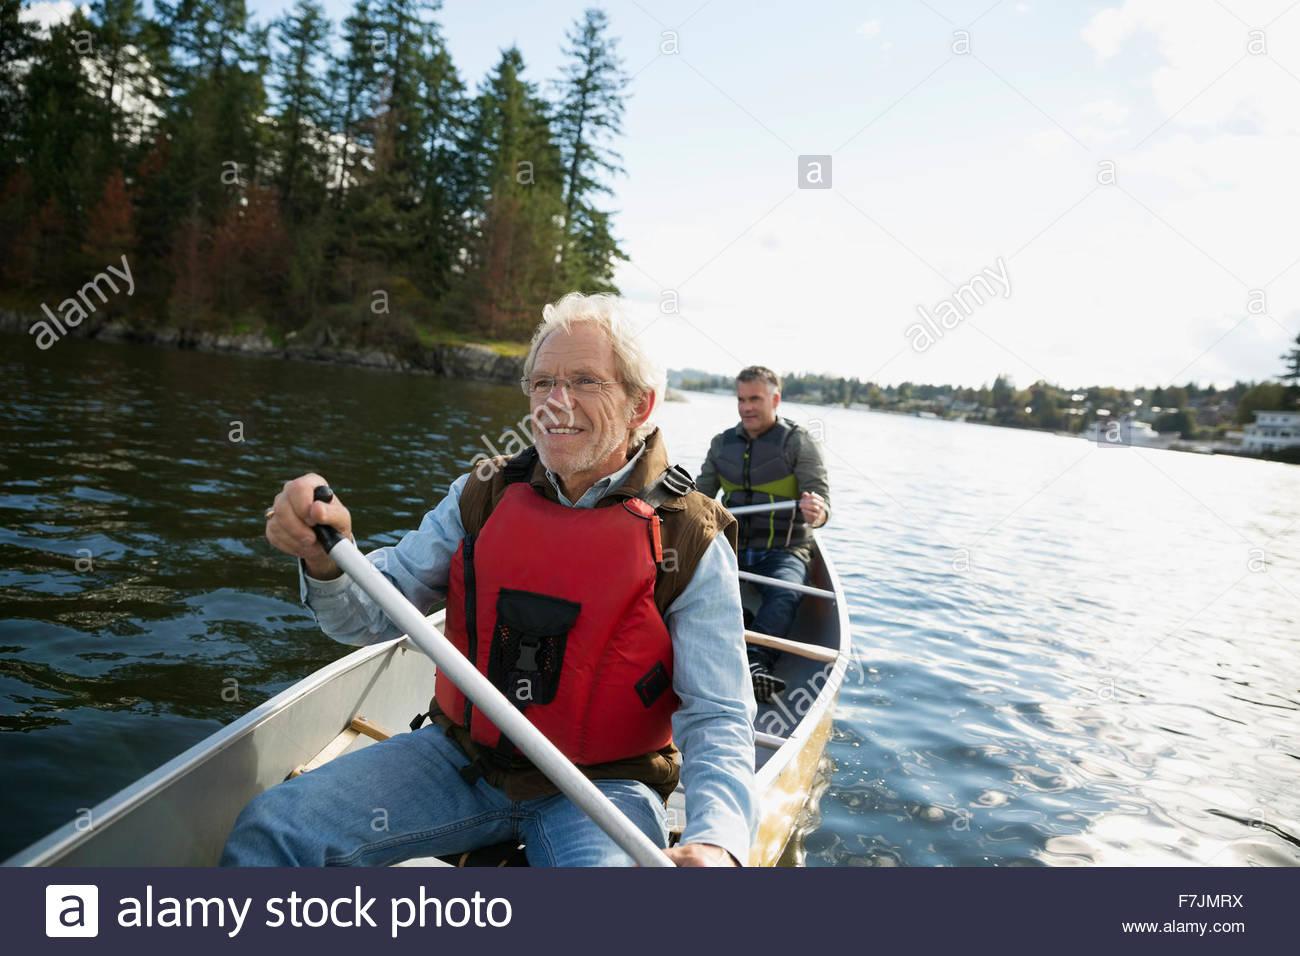 Padre e hijo canotaje en el lago Imagen De Stock